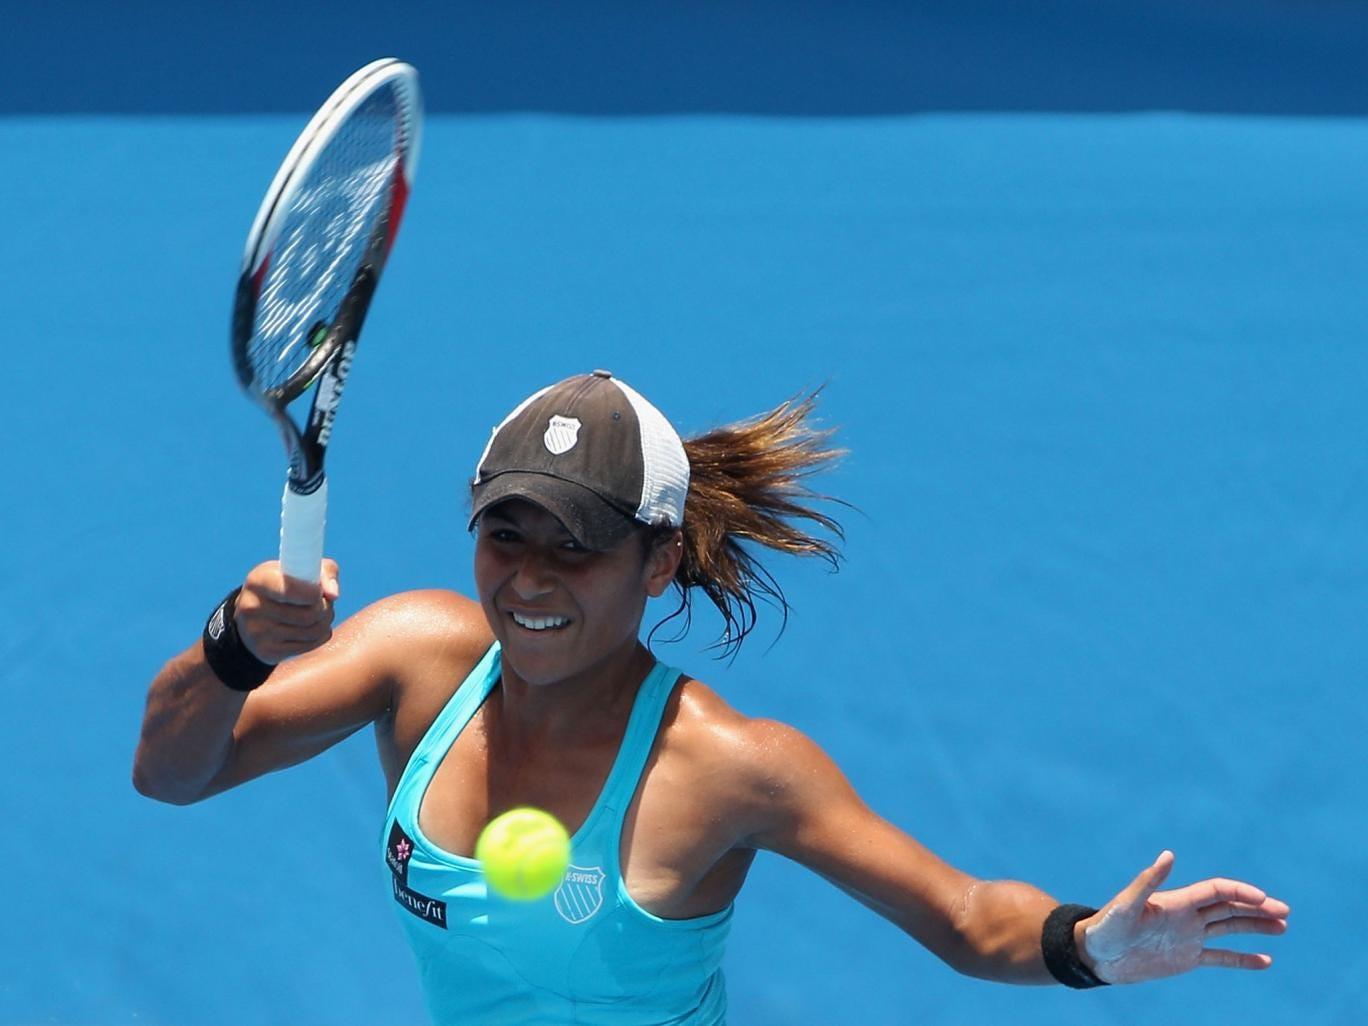 Watson overcame nerves to defeat Australian Arina Rodionova in the first round